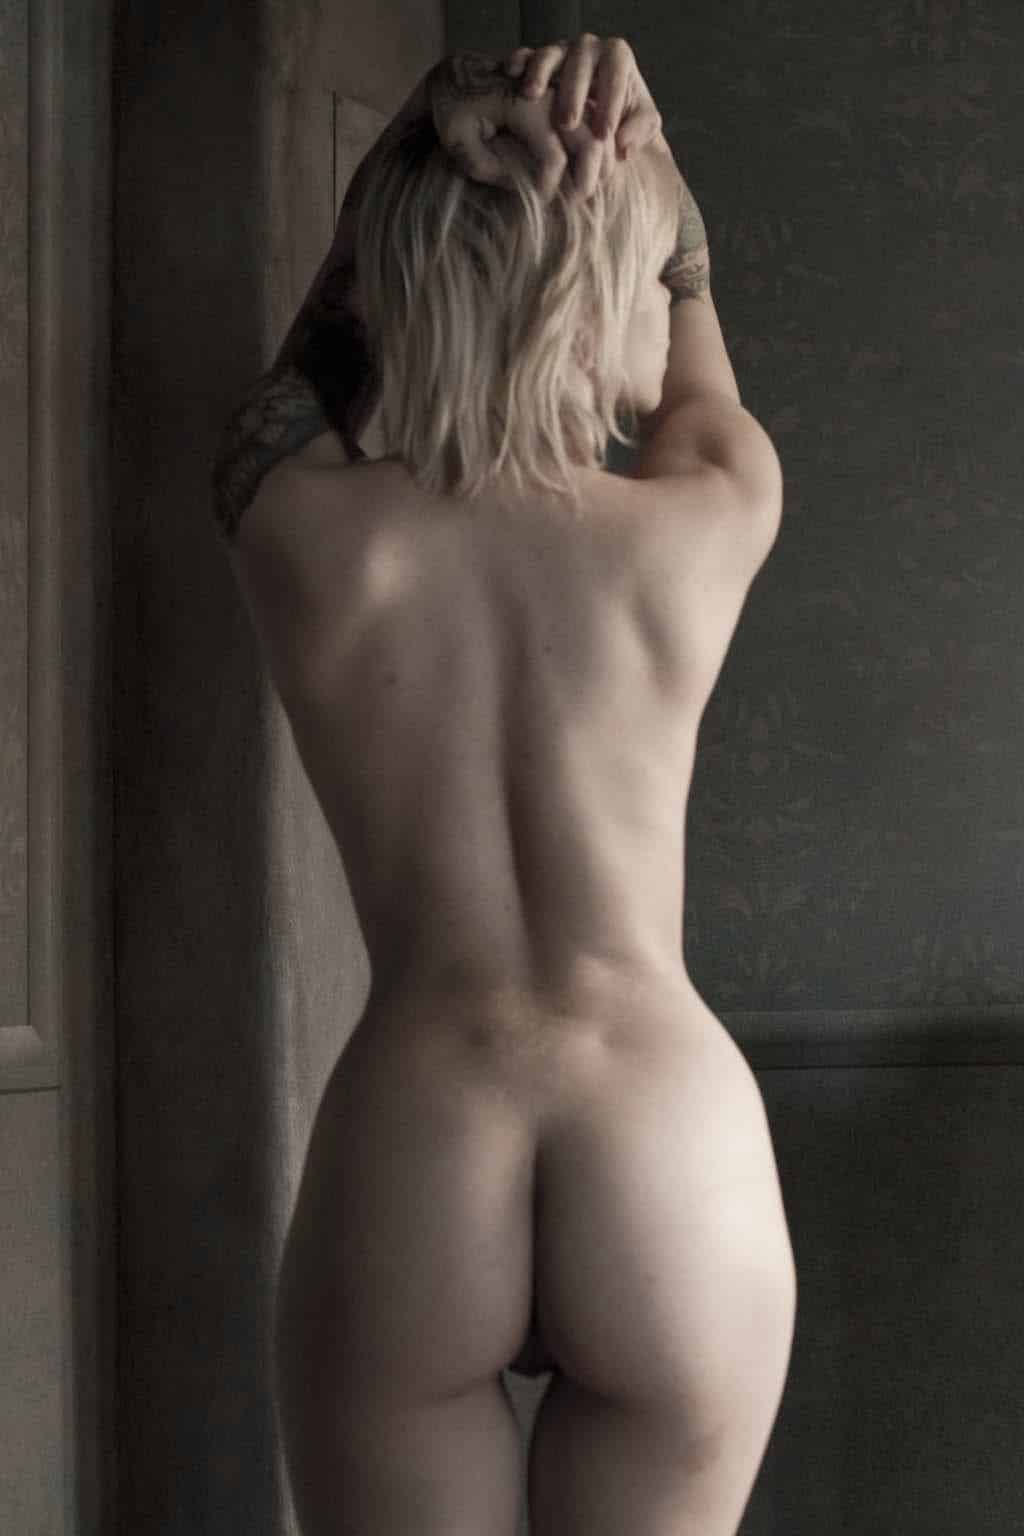 Ray Mattos - Fotos nua e pelada